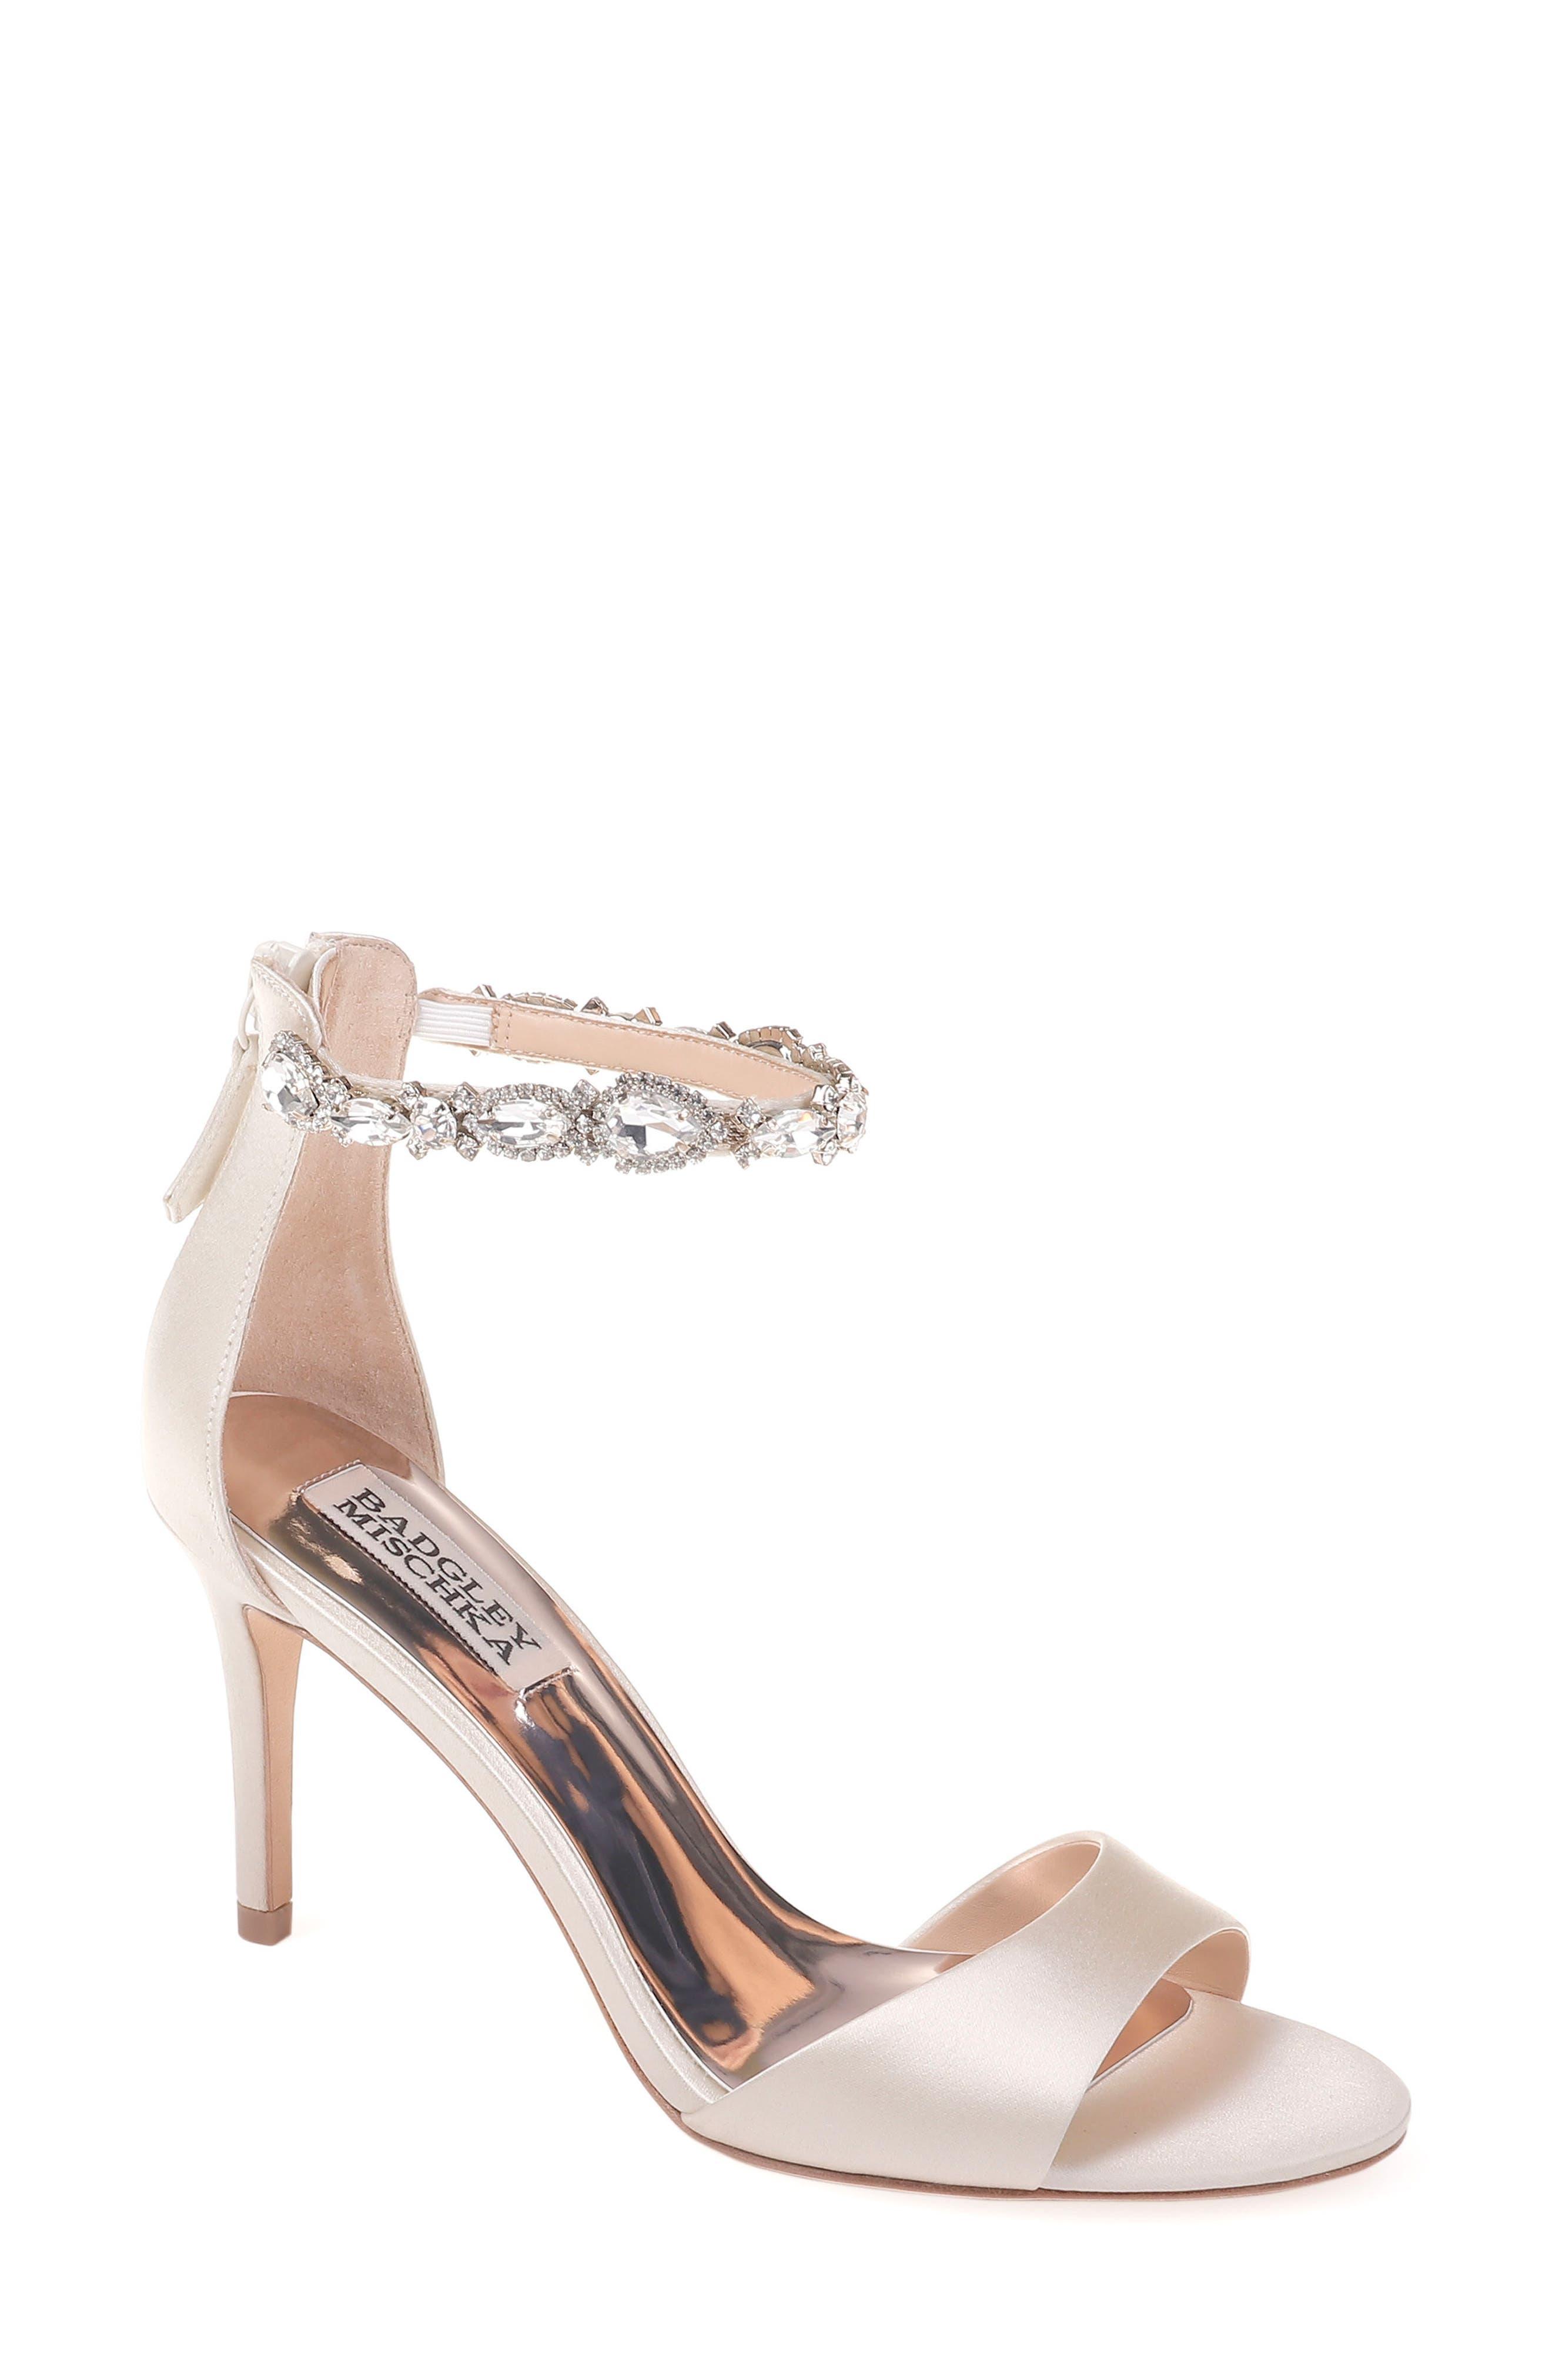 Badgley Mischka Sindy Ankle Strap Sandal,                         Main,                         color, IVORY SATIN